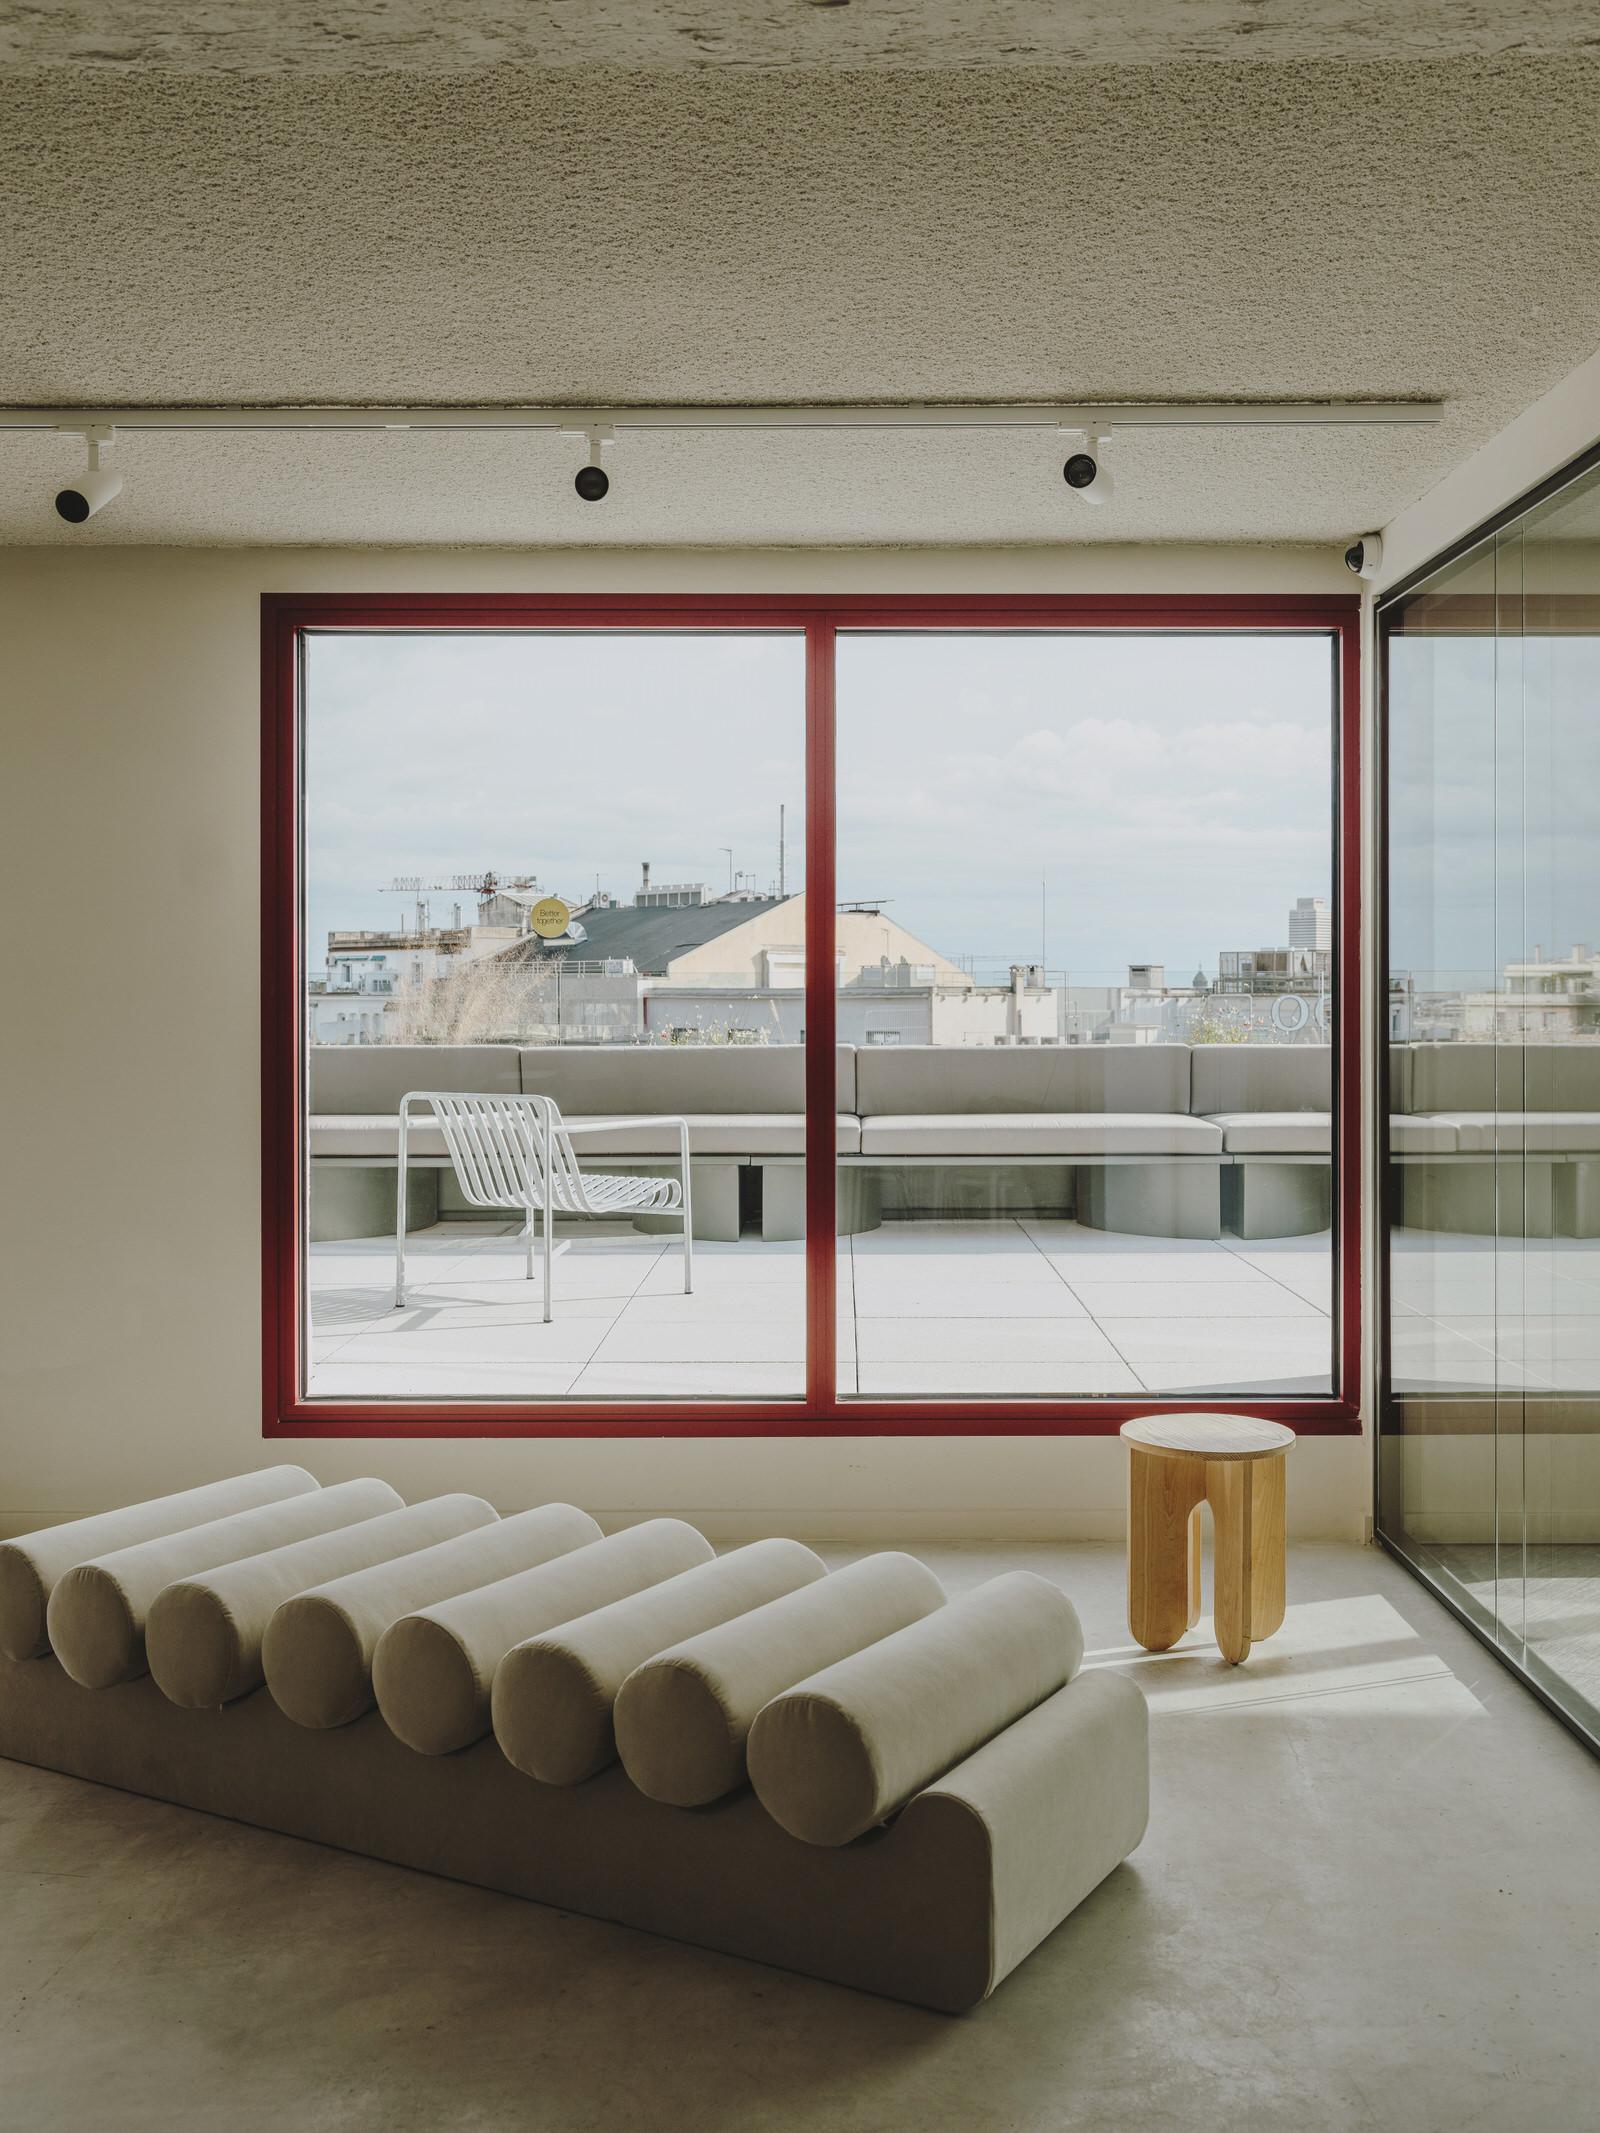 Cloudworks Office Penthouse in Barcelona by MESURA.